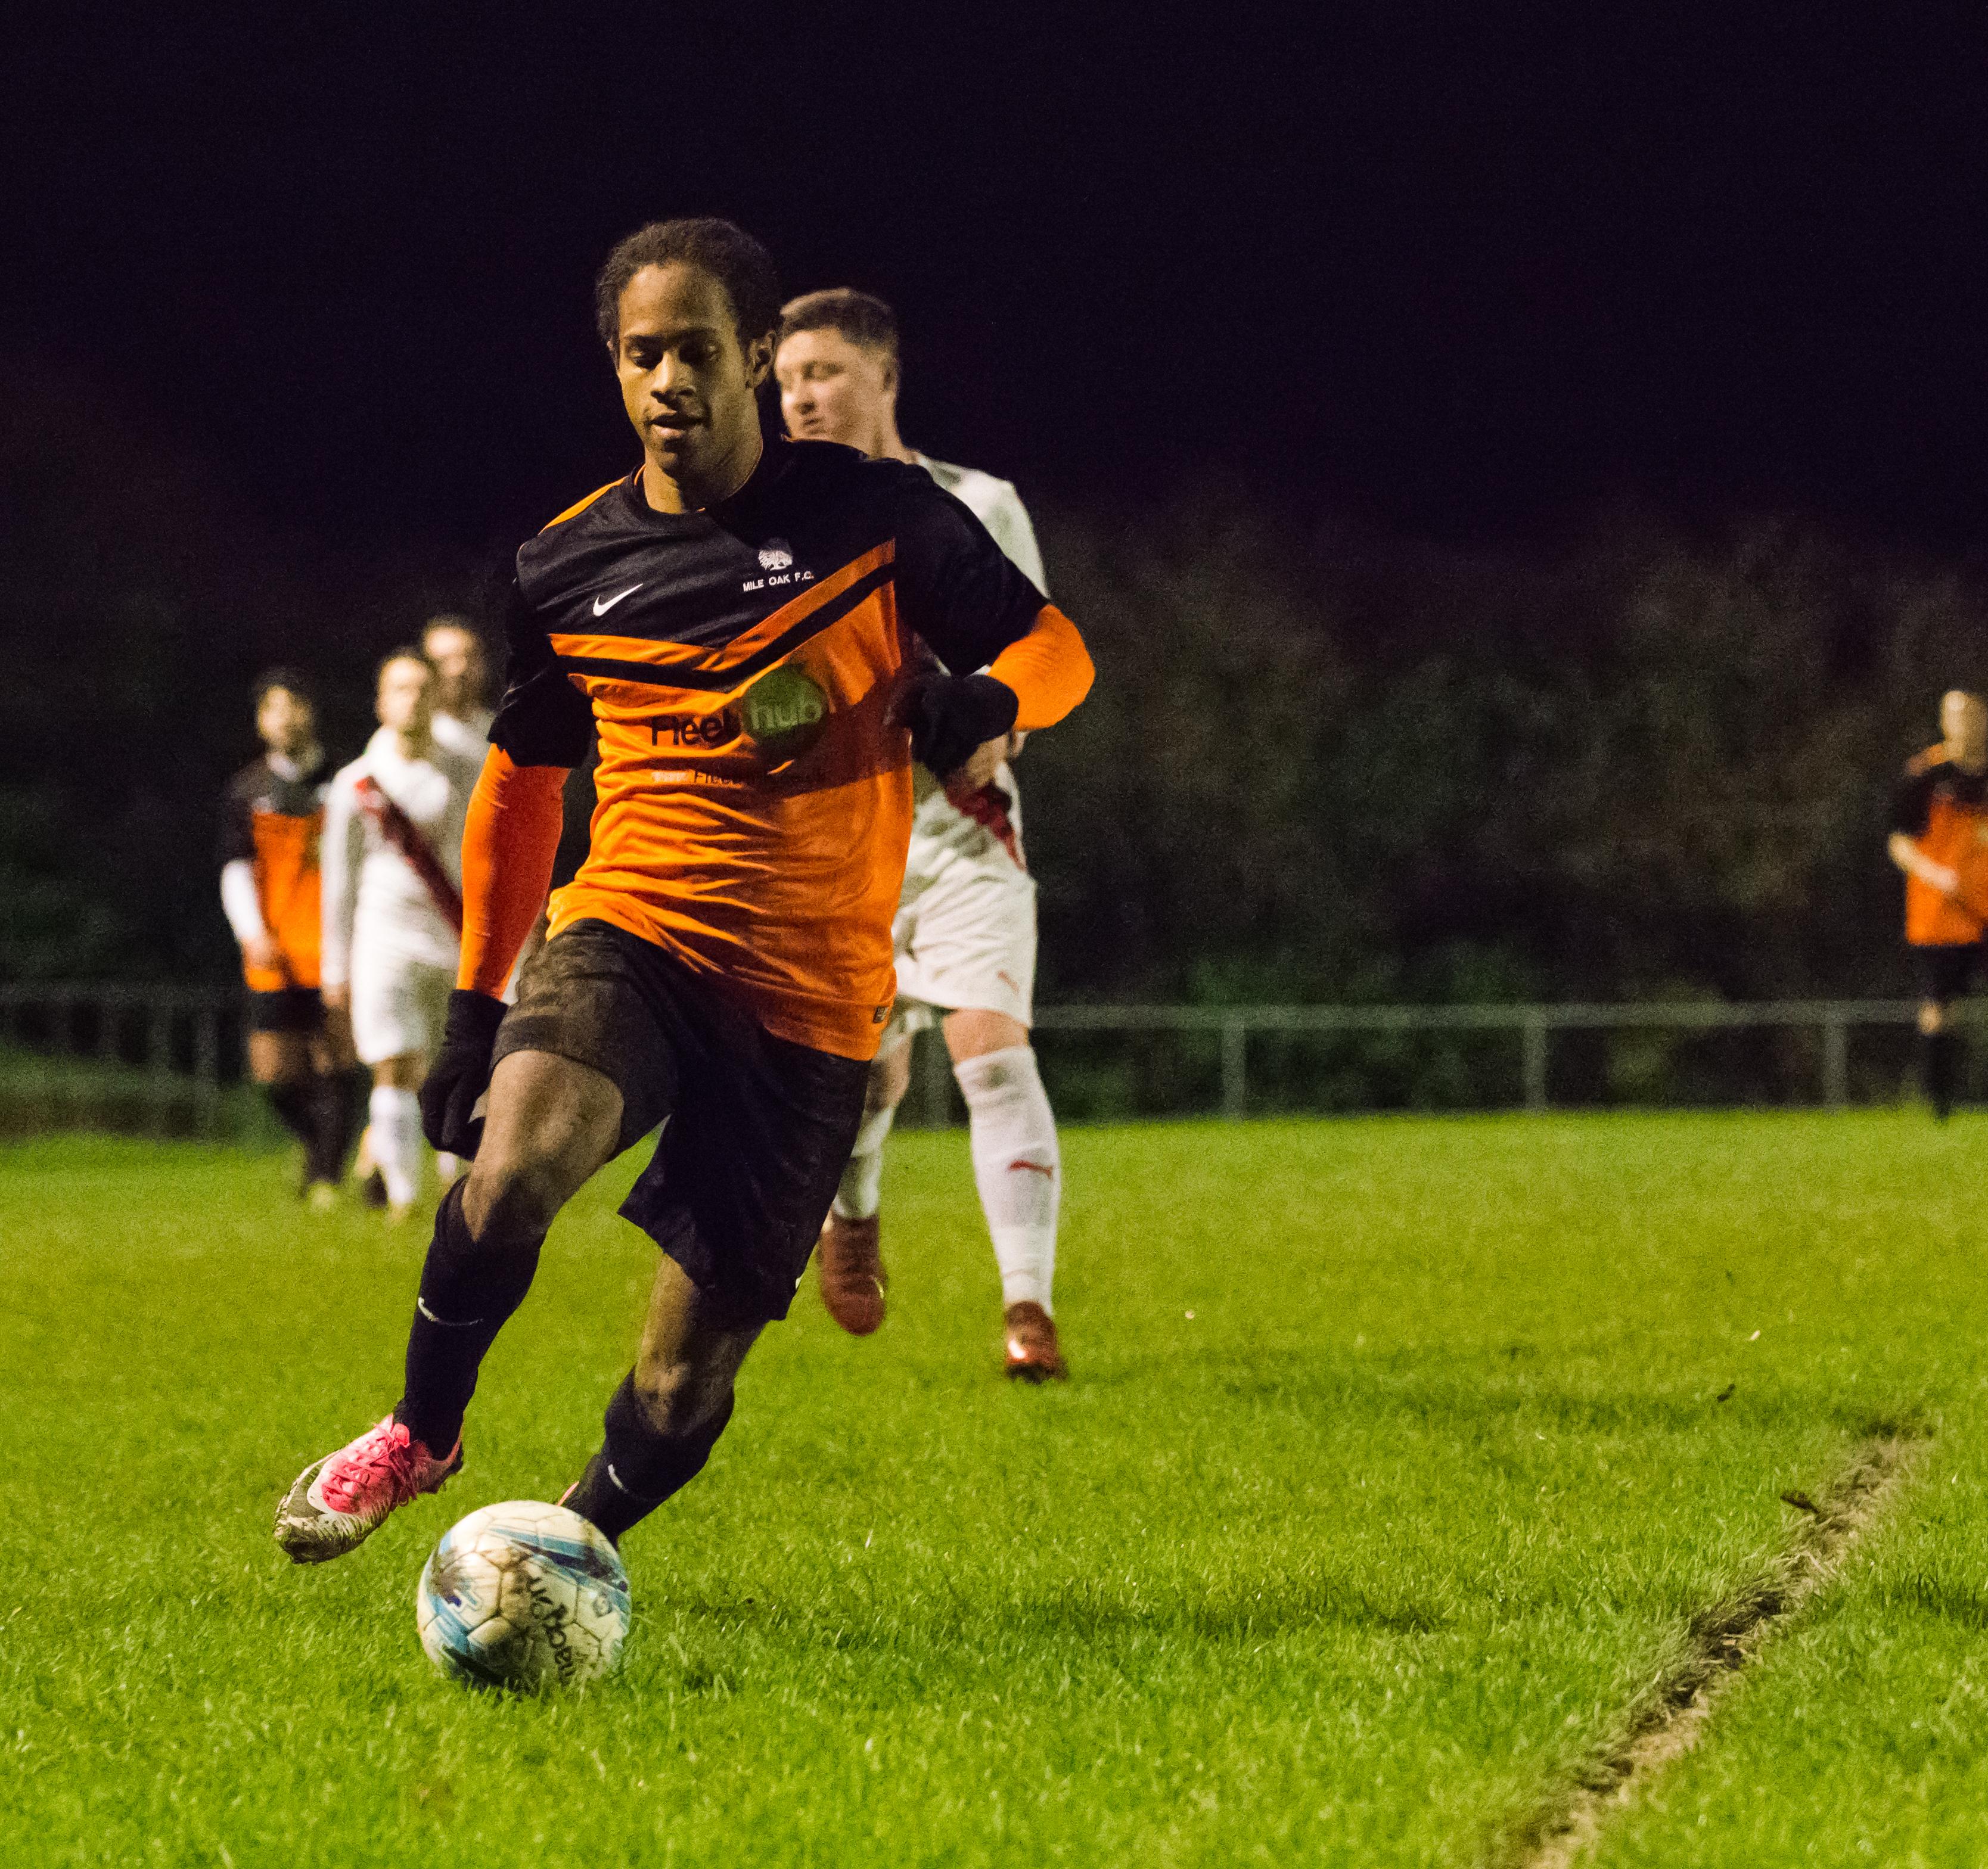 Mile Oak U21s vs Southwick FC U21s 14.12.17 07